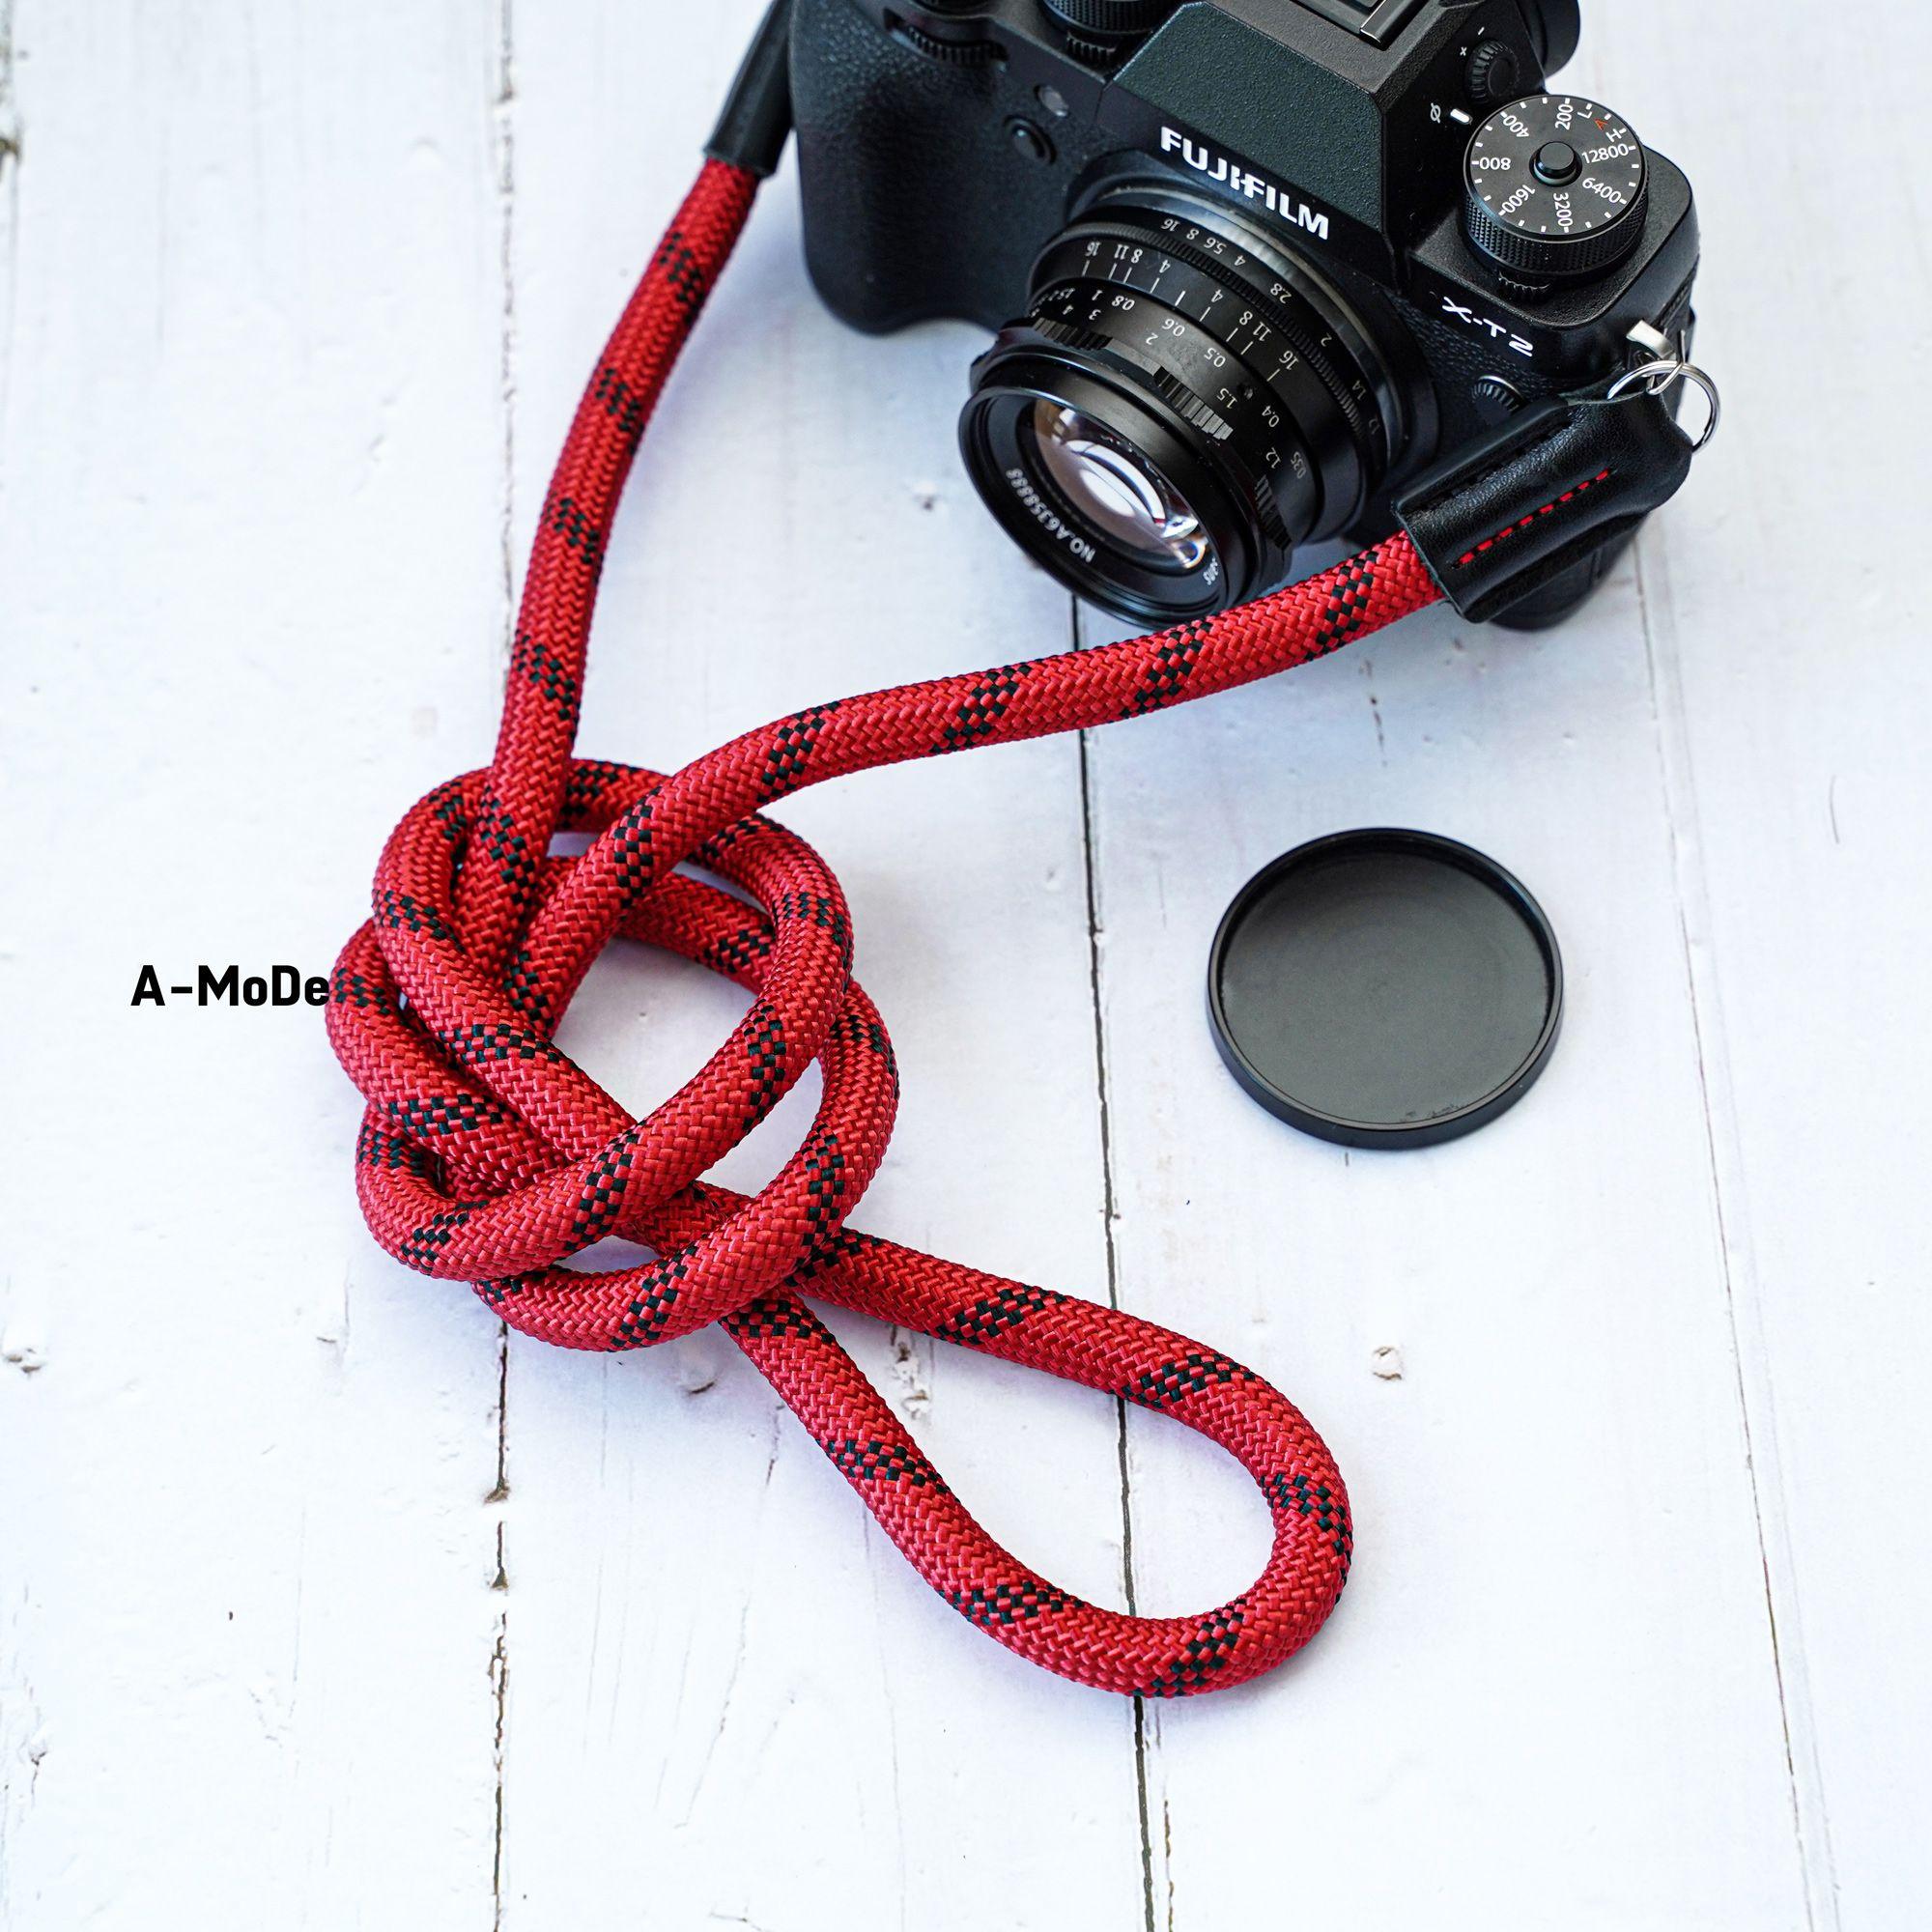 #photography #film #amodecasa #fujifilm #sony #a7m3 #landscapephotography #camerastrap #camera #climbing ropes #beal #singingrock #etsyshop #ropecamerastrap #ropetwist  #cameracase #camerainsert #camerastrap #camerabag #camerabackpack #cameragirl #mirrorlesscamera #pinkoi #canonphotography #fujifilm #filmphotography #filmcamera #filmphoto #etsyshop #lieca #lens #pelican